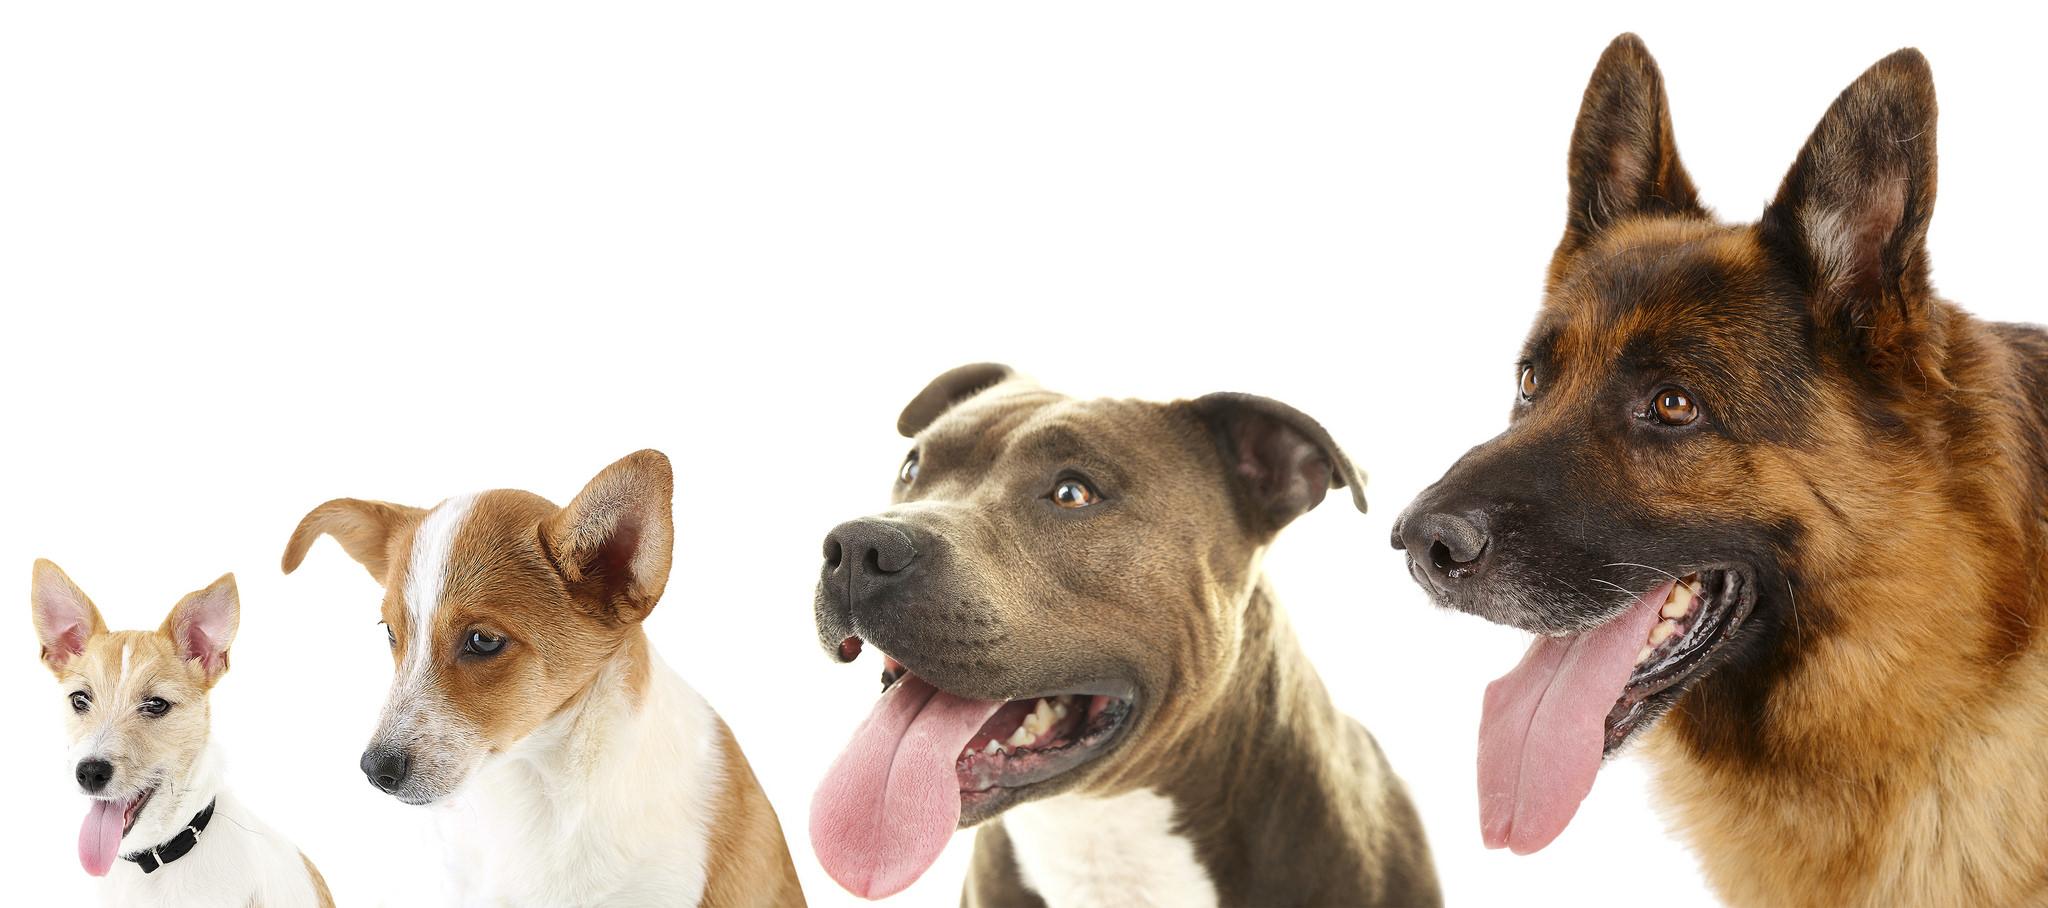 Dog Show at Brooklands Fun Day at Community Park Weybridge Surrey